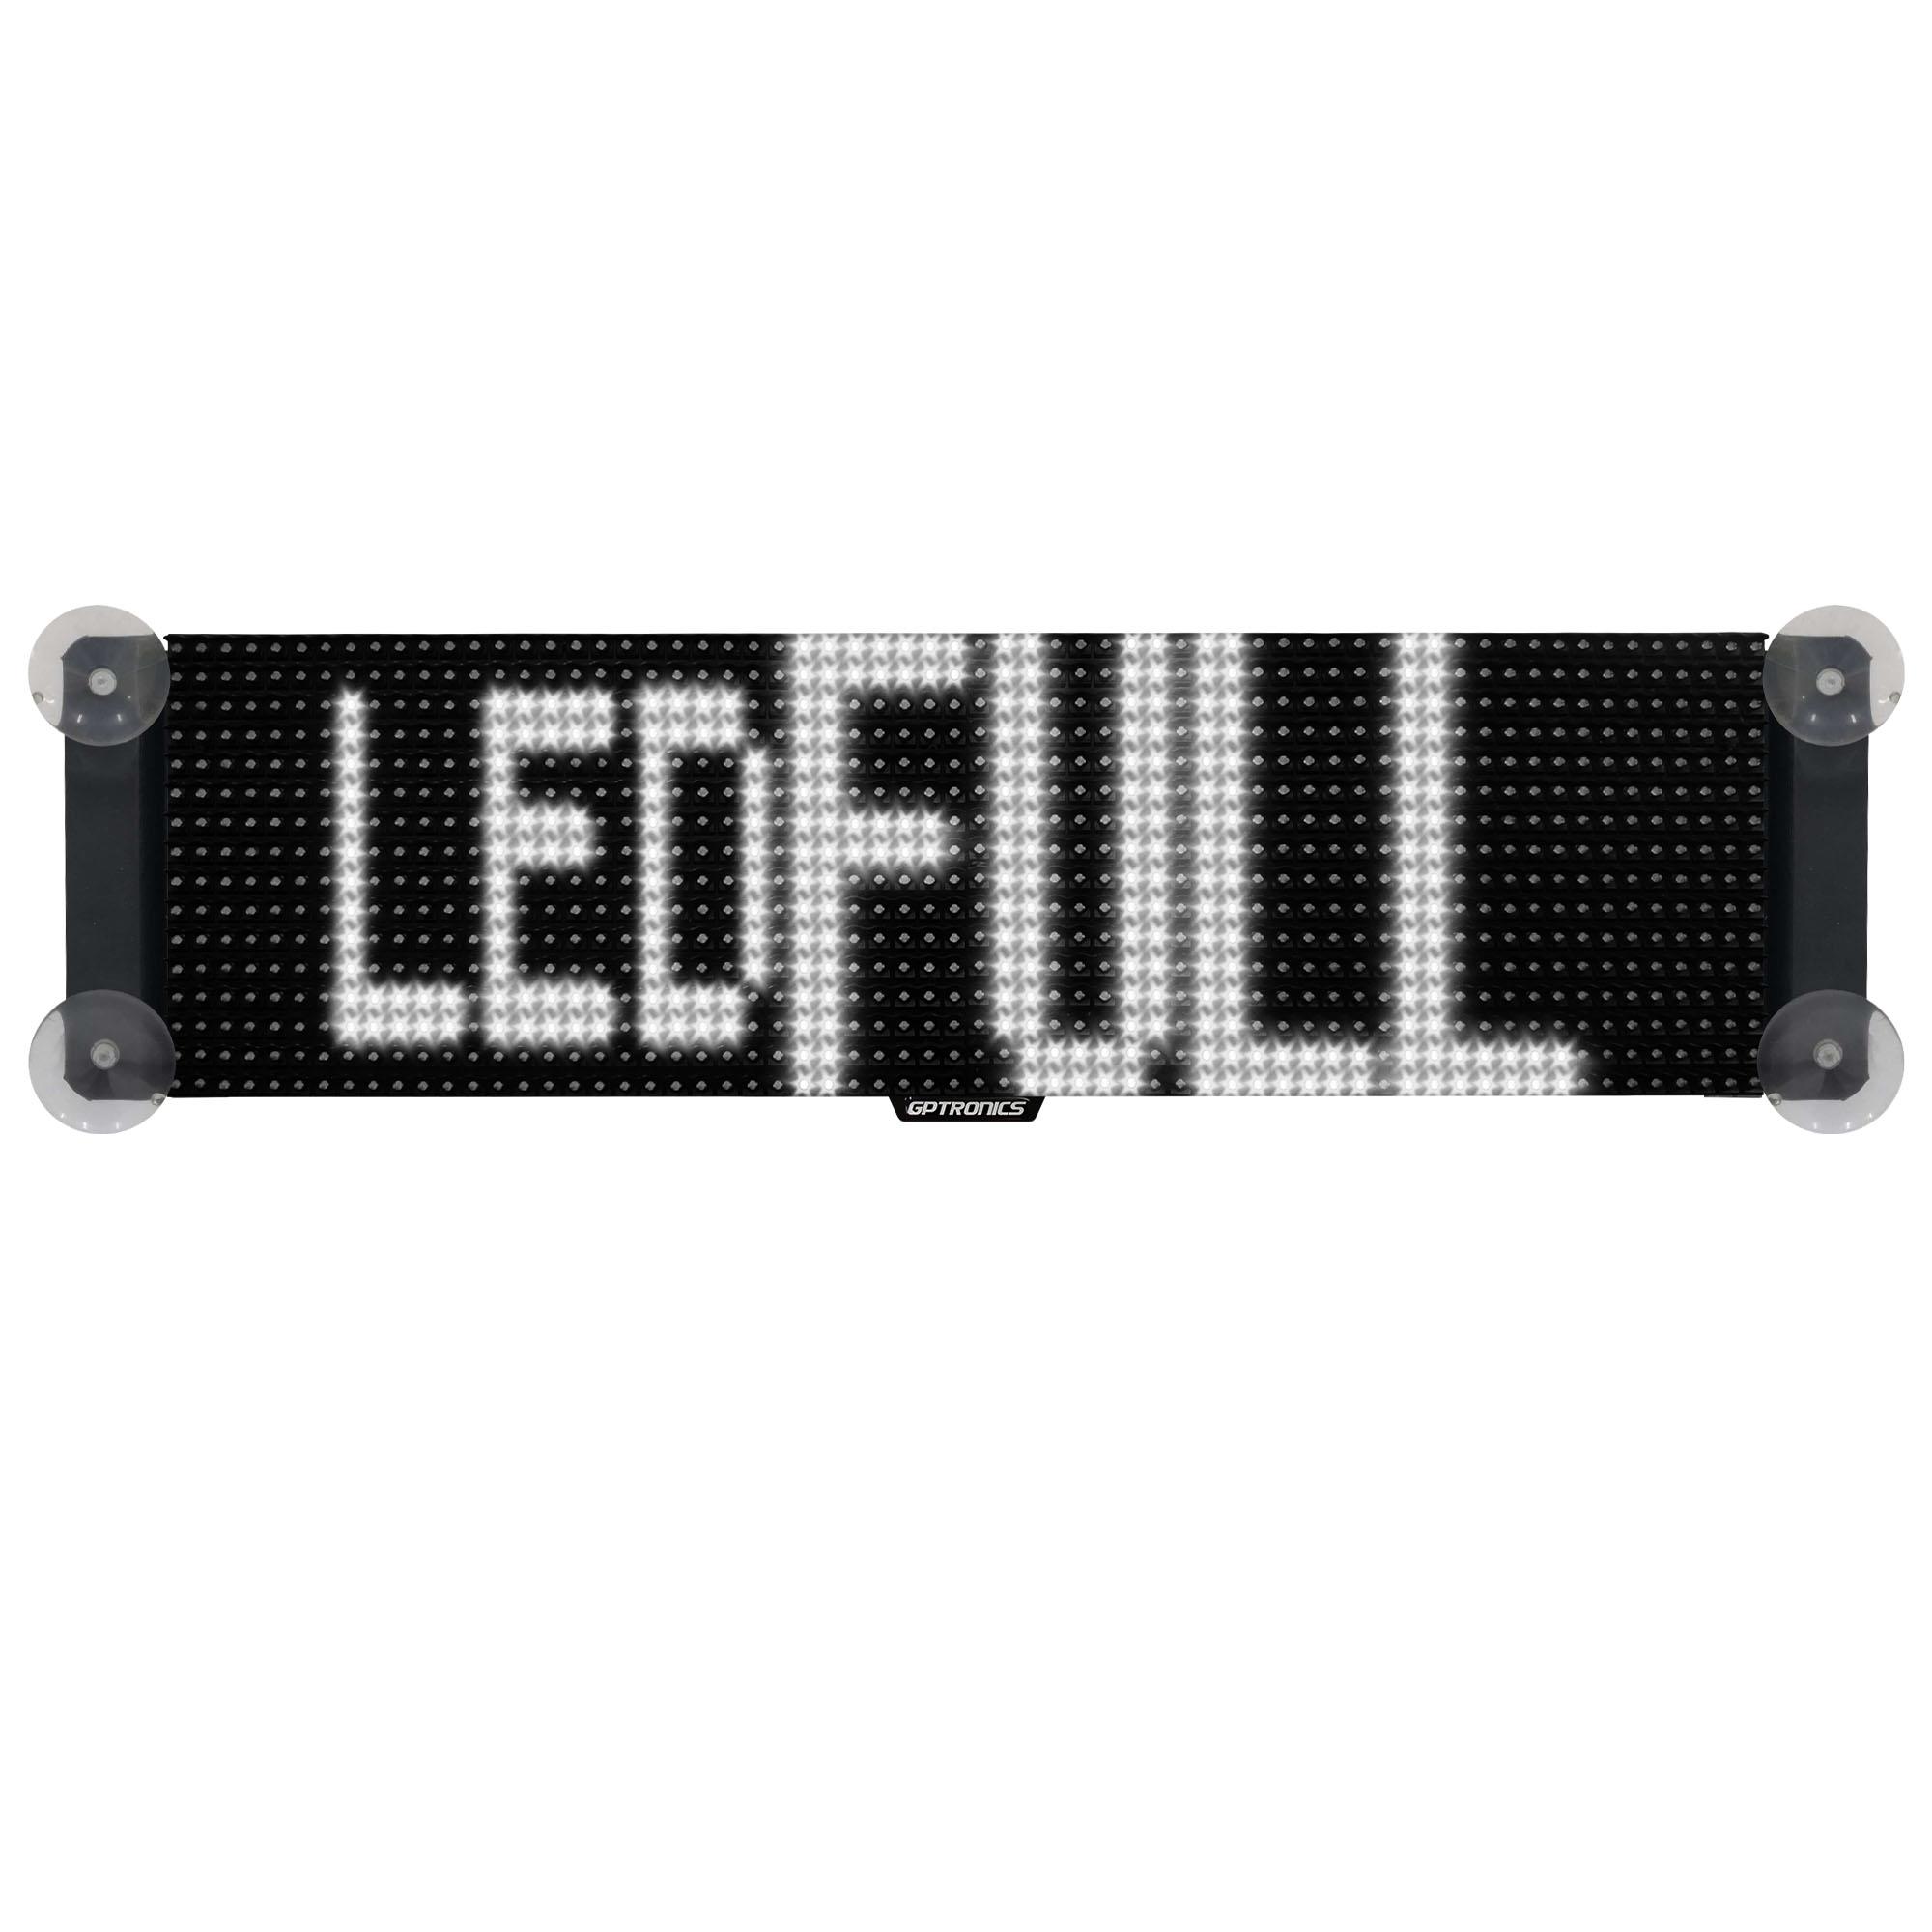 Painel de Mensagens Veicular LED Full M2 Branco (Uso Interno) - 64x16 cm